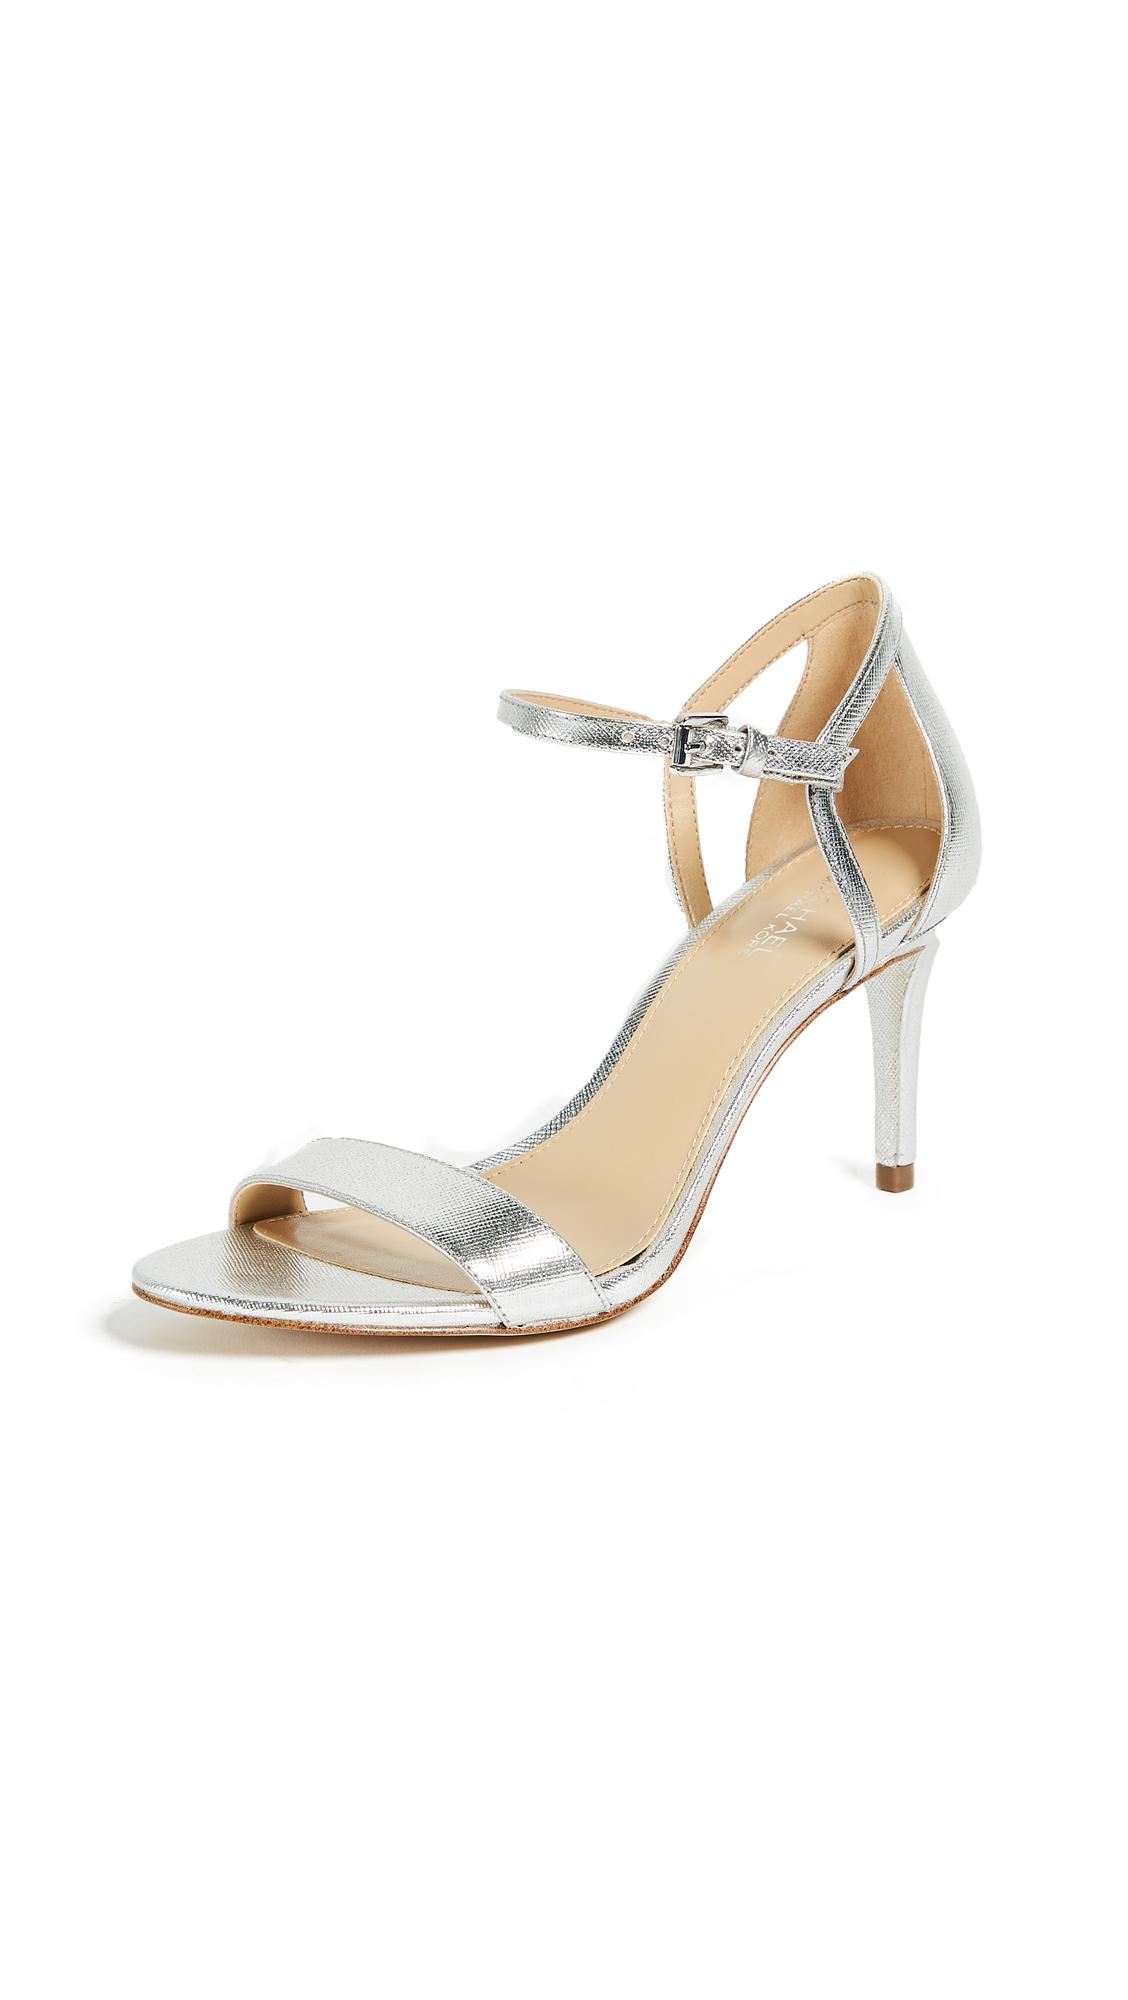 MICHAEL Michael Kors Simone Mid Sandals - Silver